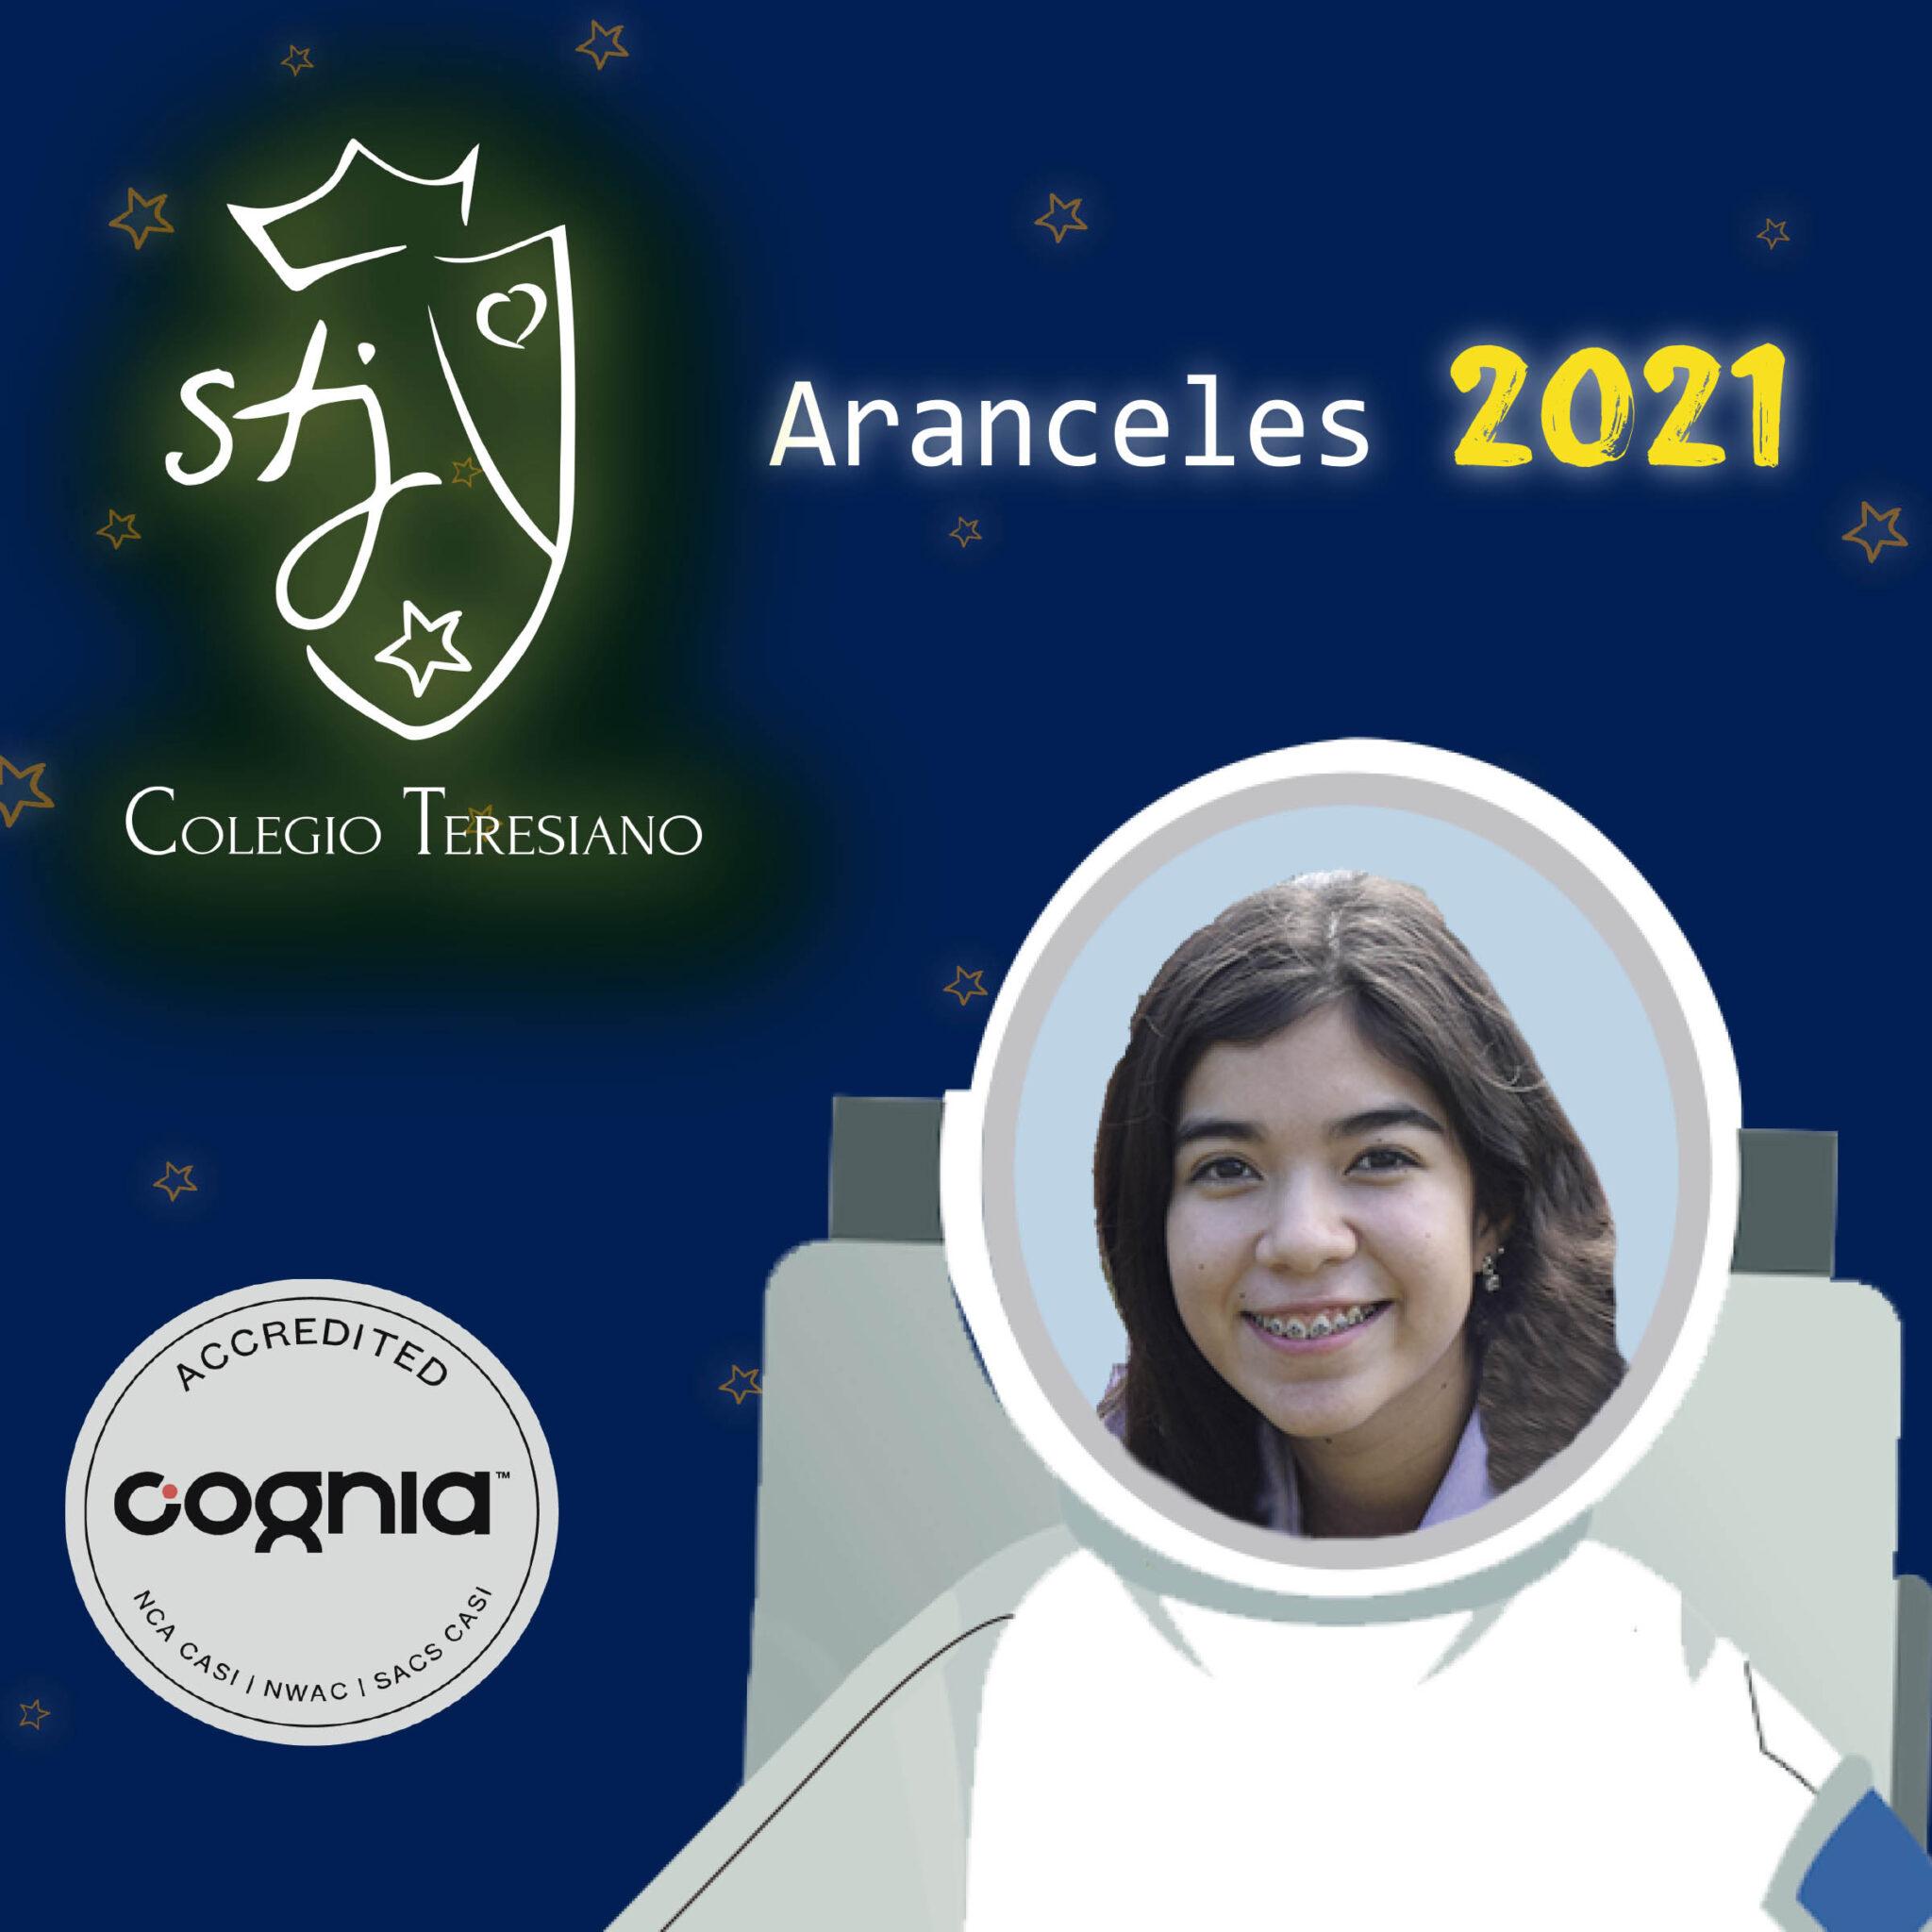 ARANCELES 2021 NUEVO INGRESO Y REINGRESO